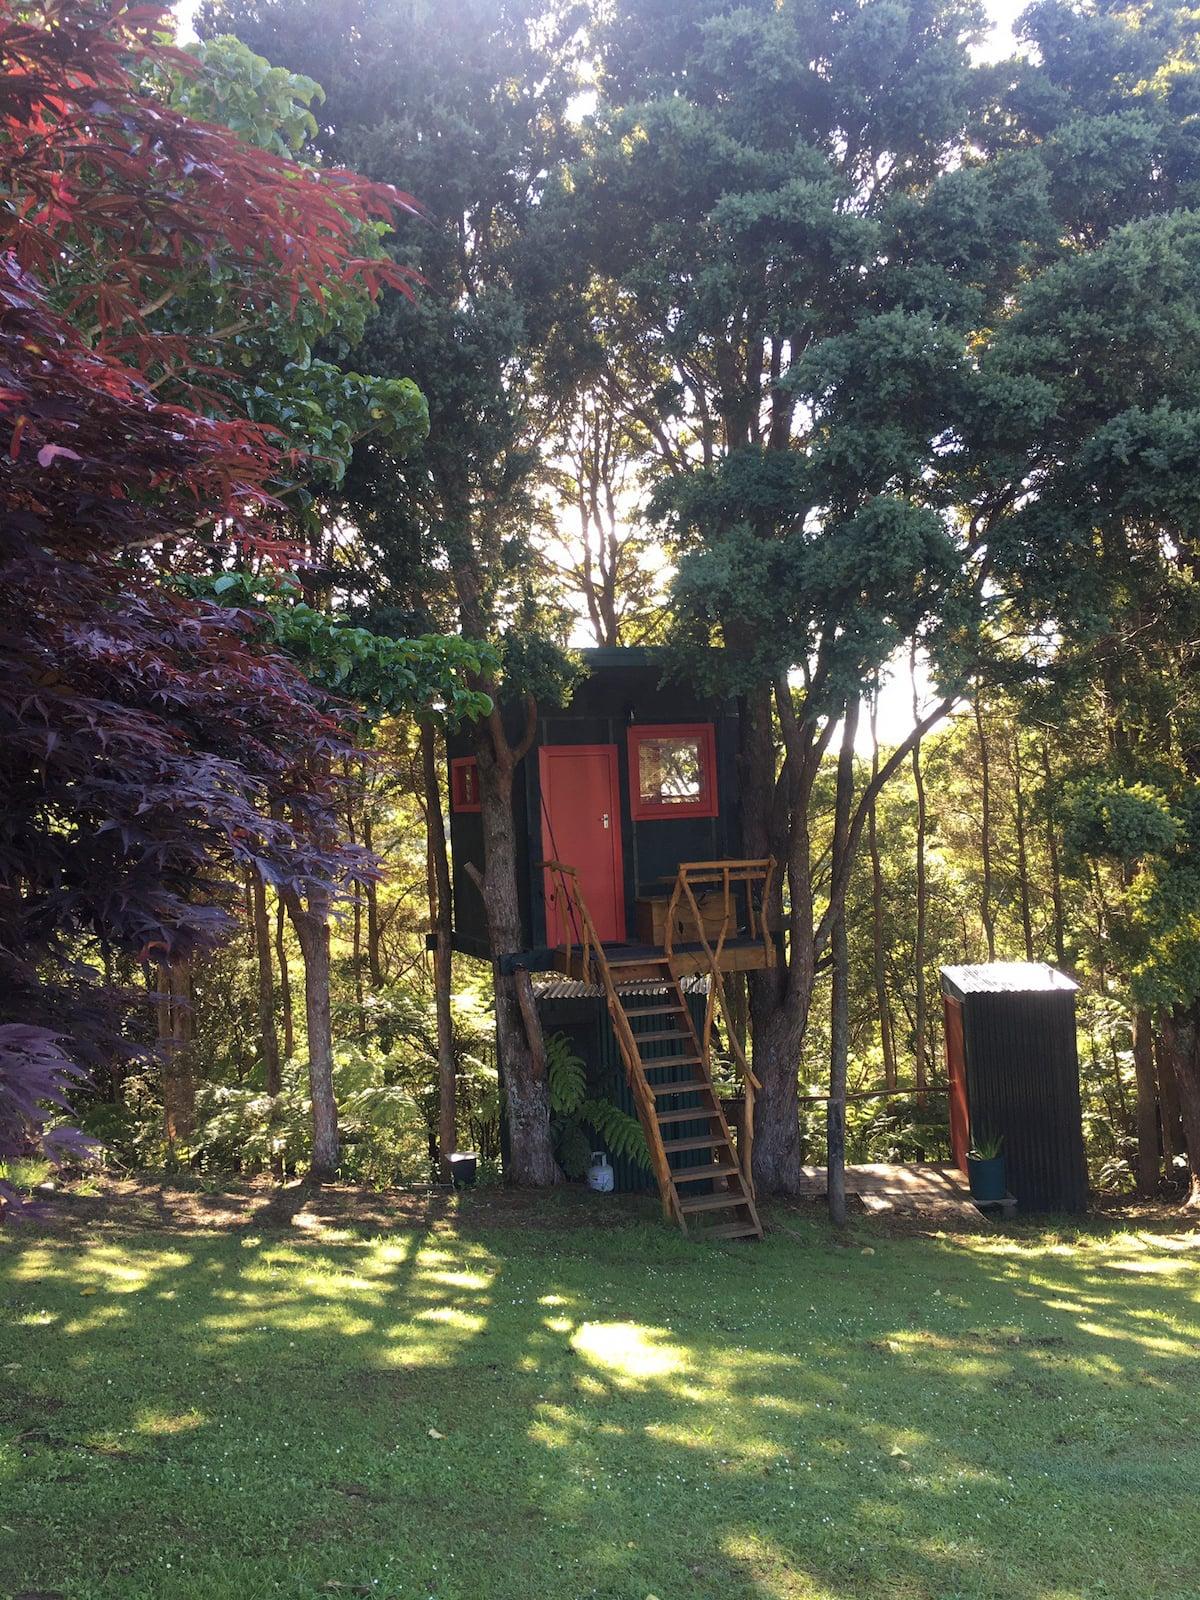 Beautiful little hut nestled amongst the trees